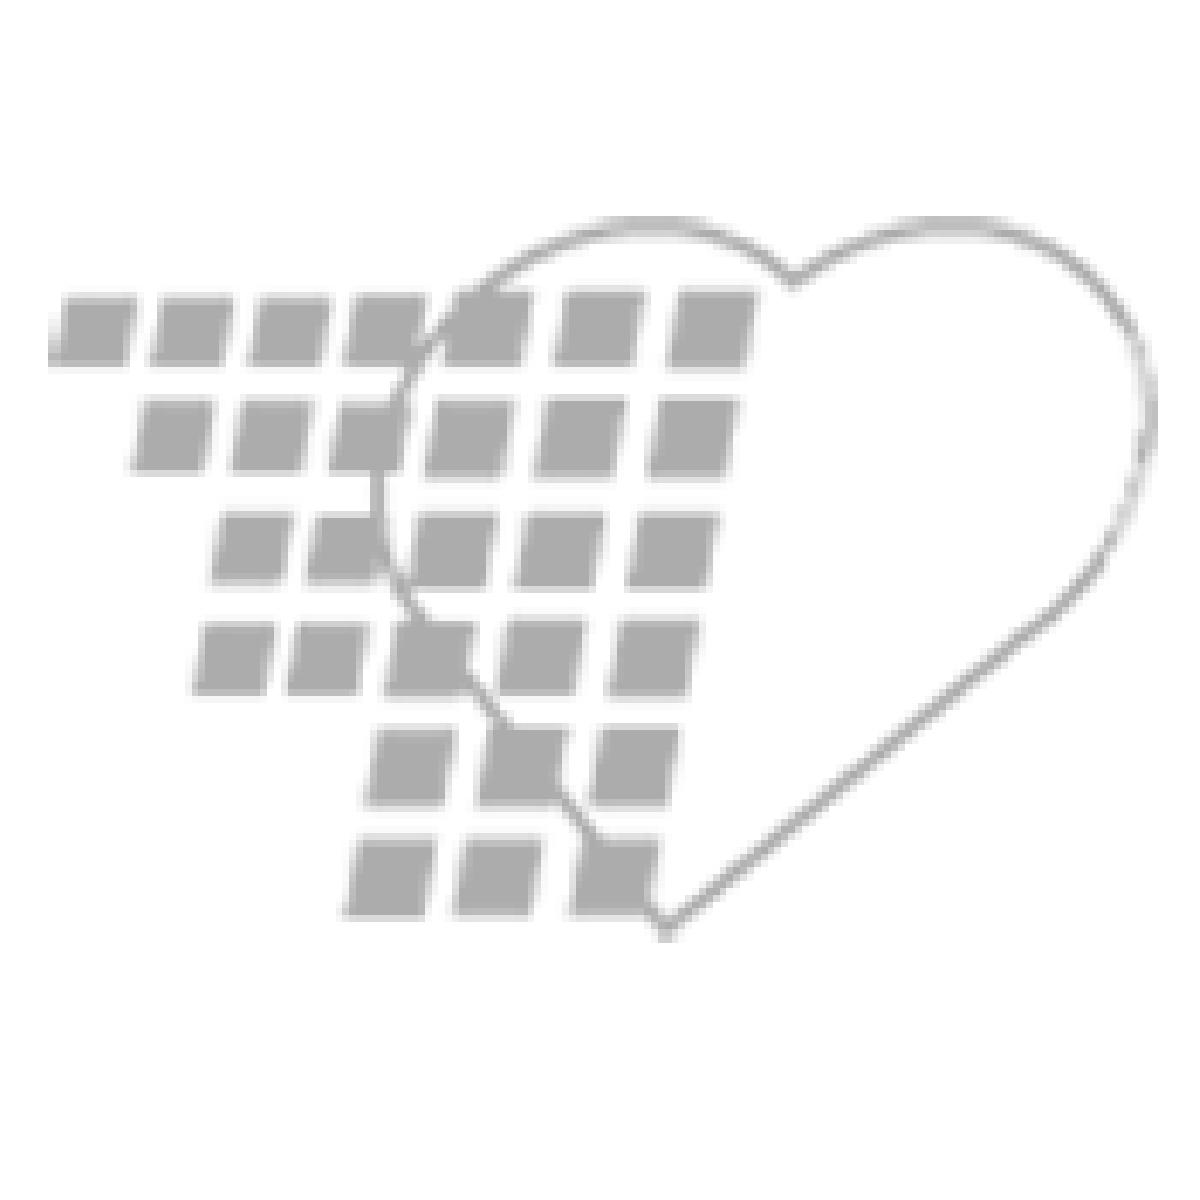 BOGOAC6P FREE CASE IV FLUID WITH ALARIS MEDLEY COMBO PURCHASE